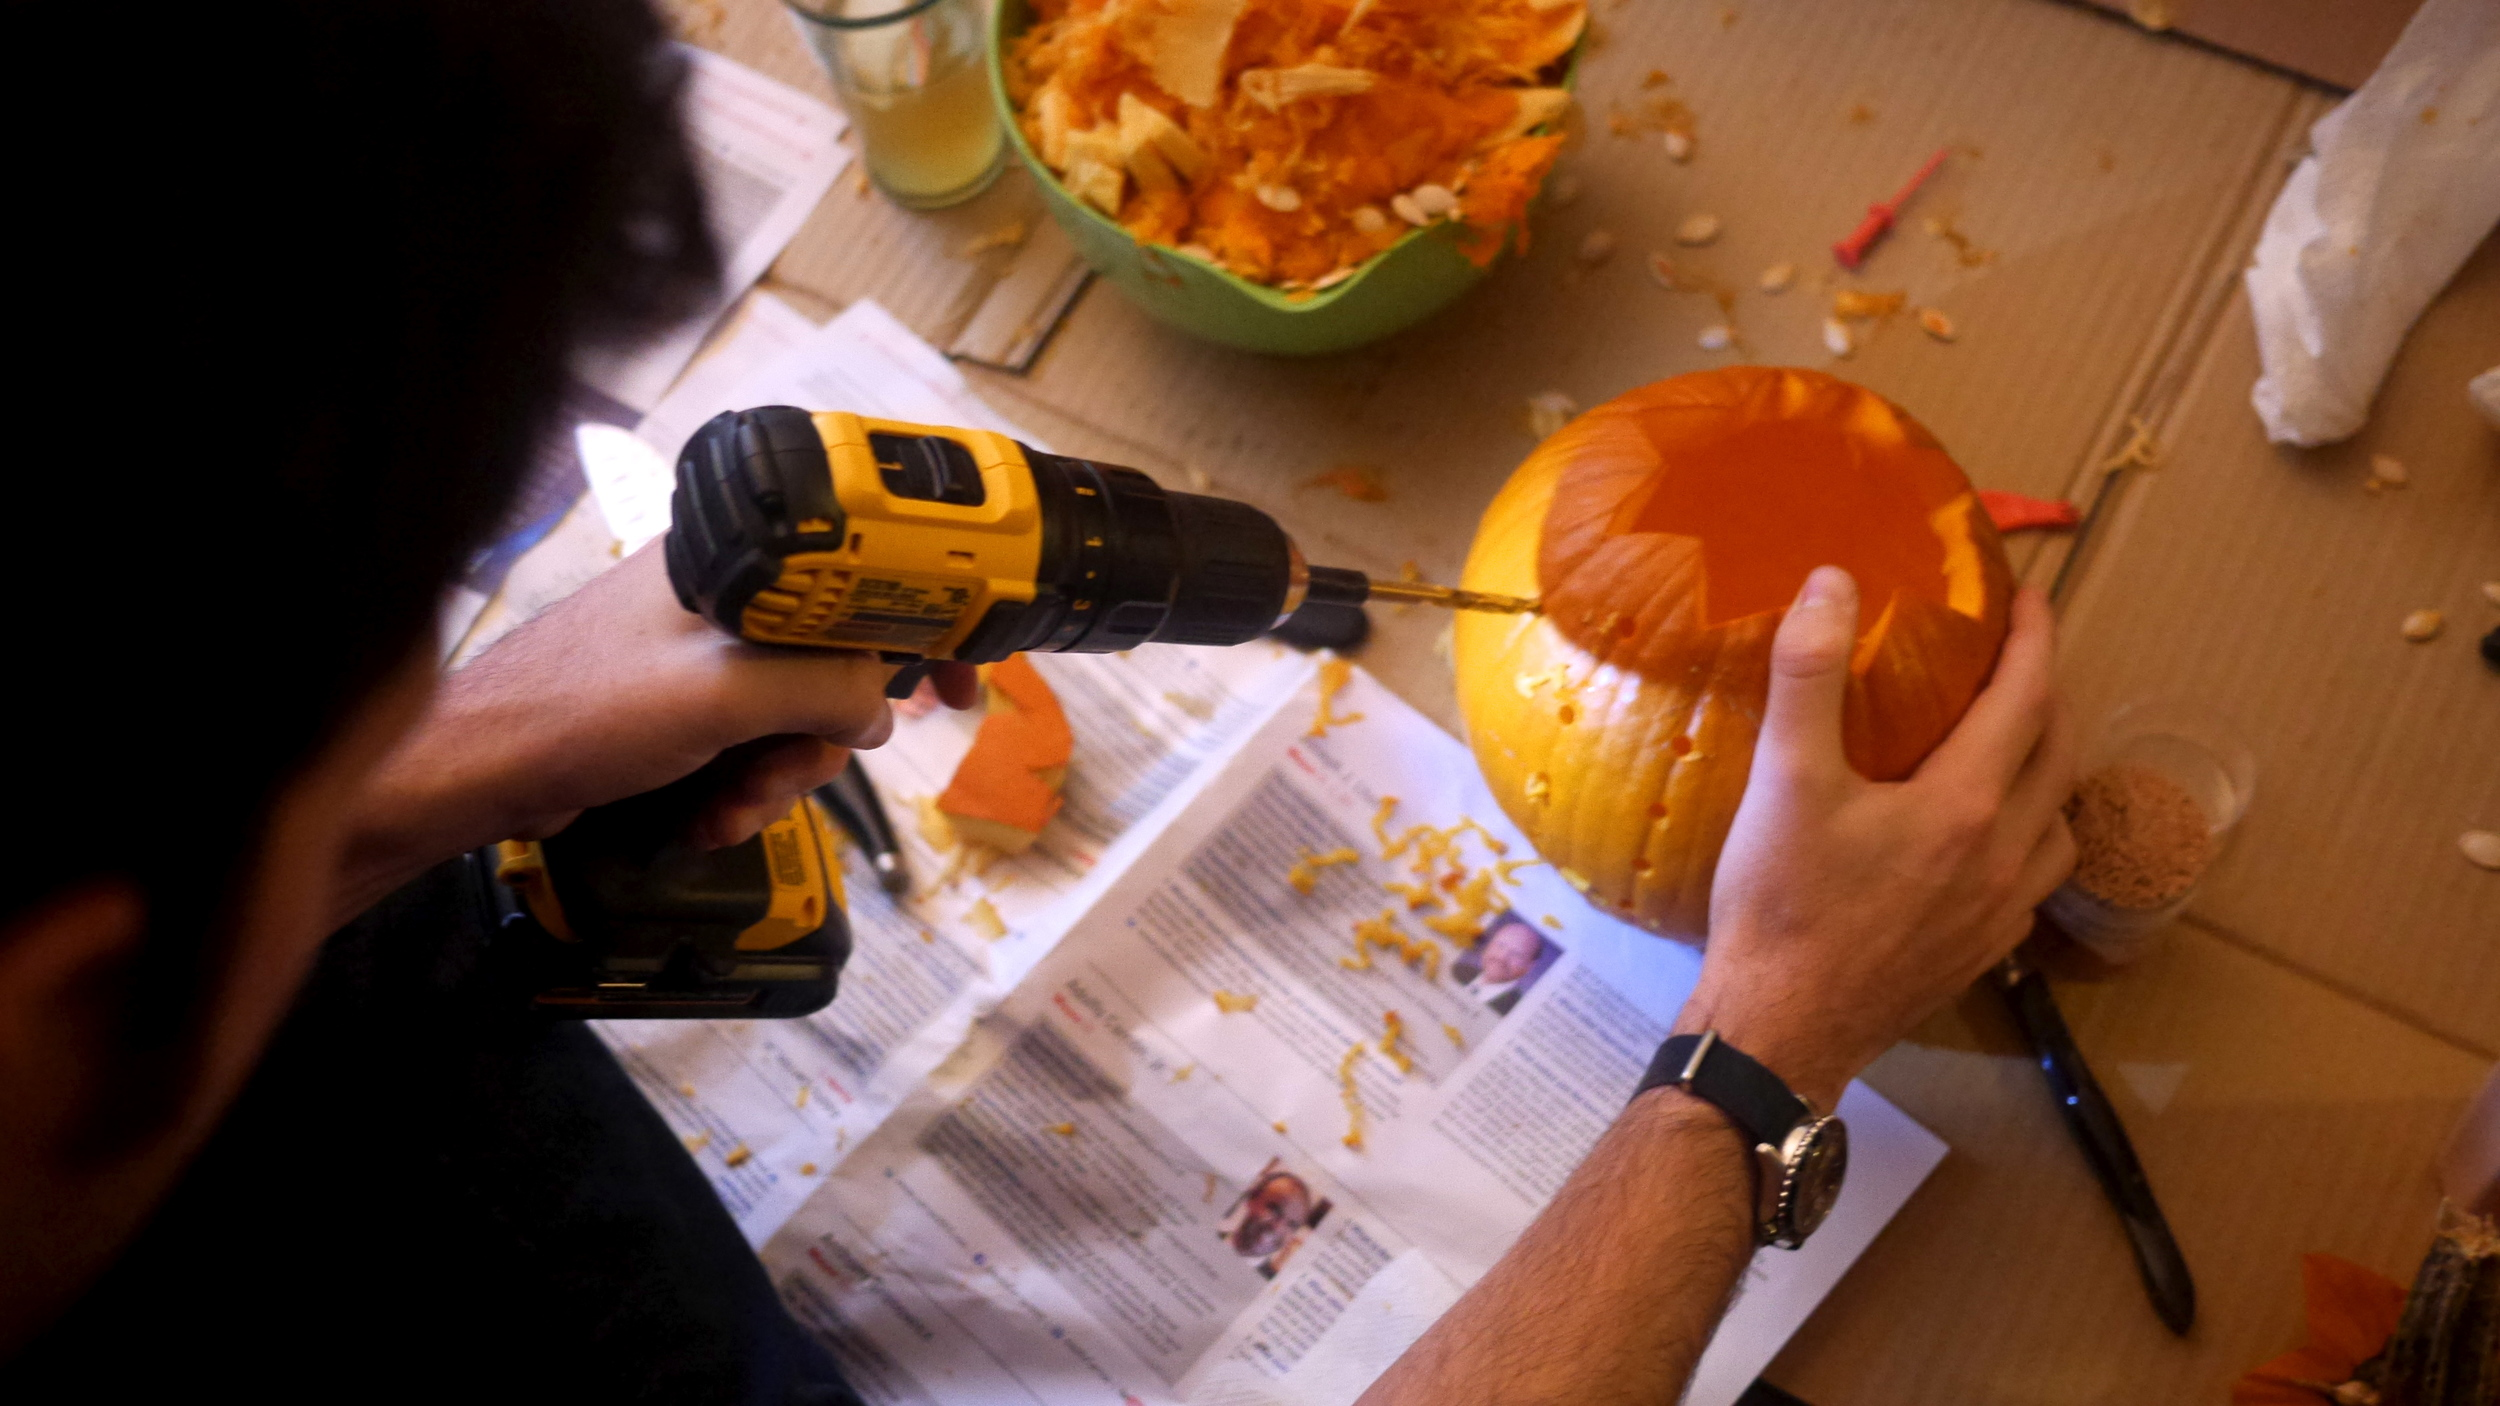 Peter & Allie used a drill to make a disco ball pumpkin (!)